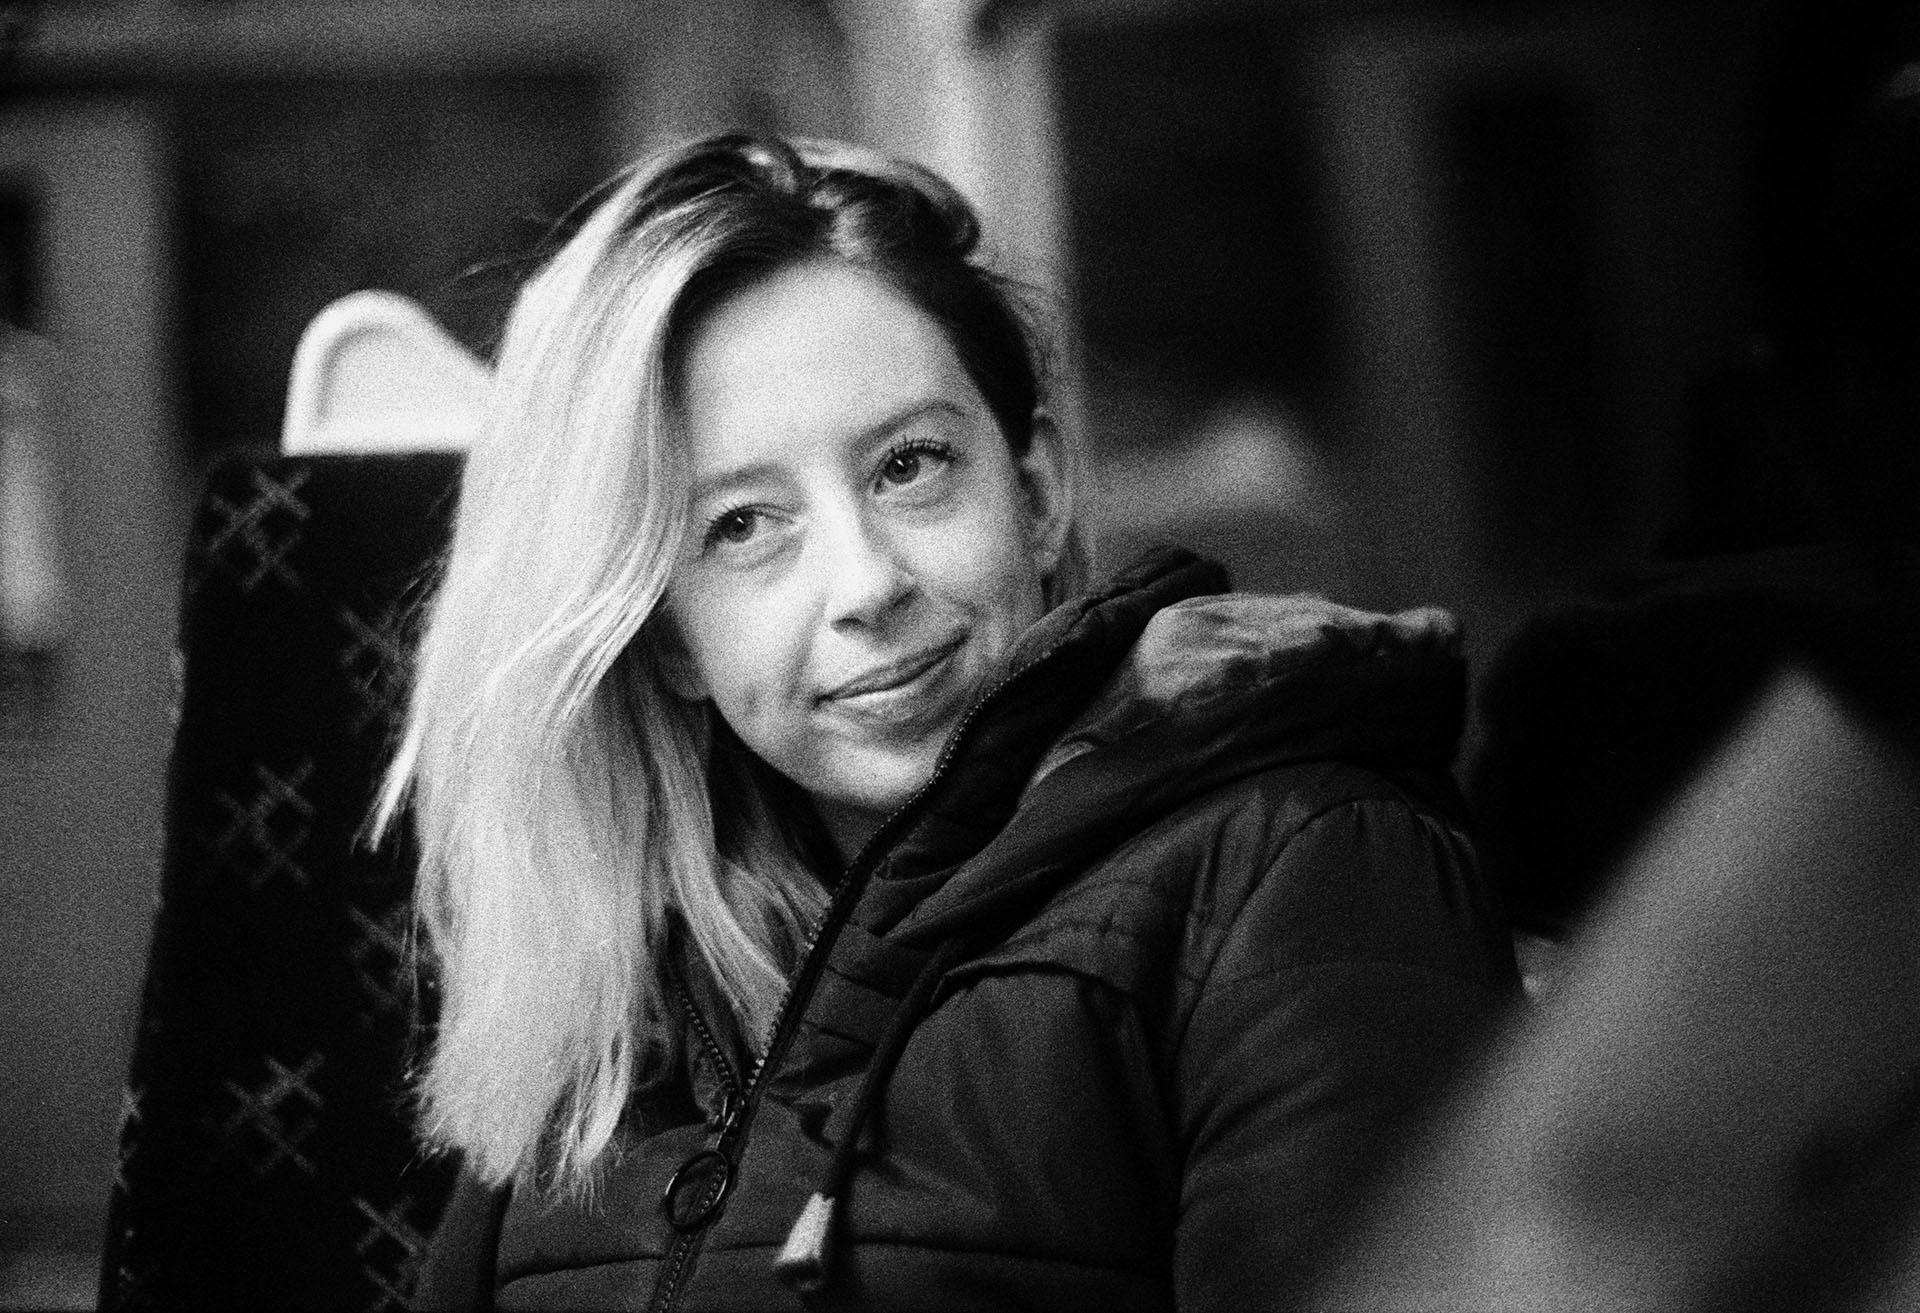 black and white 35mm portrait